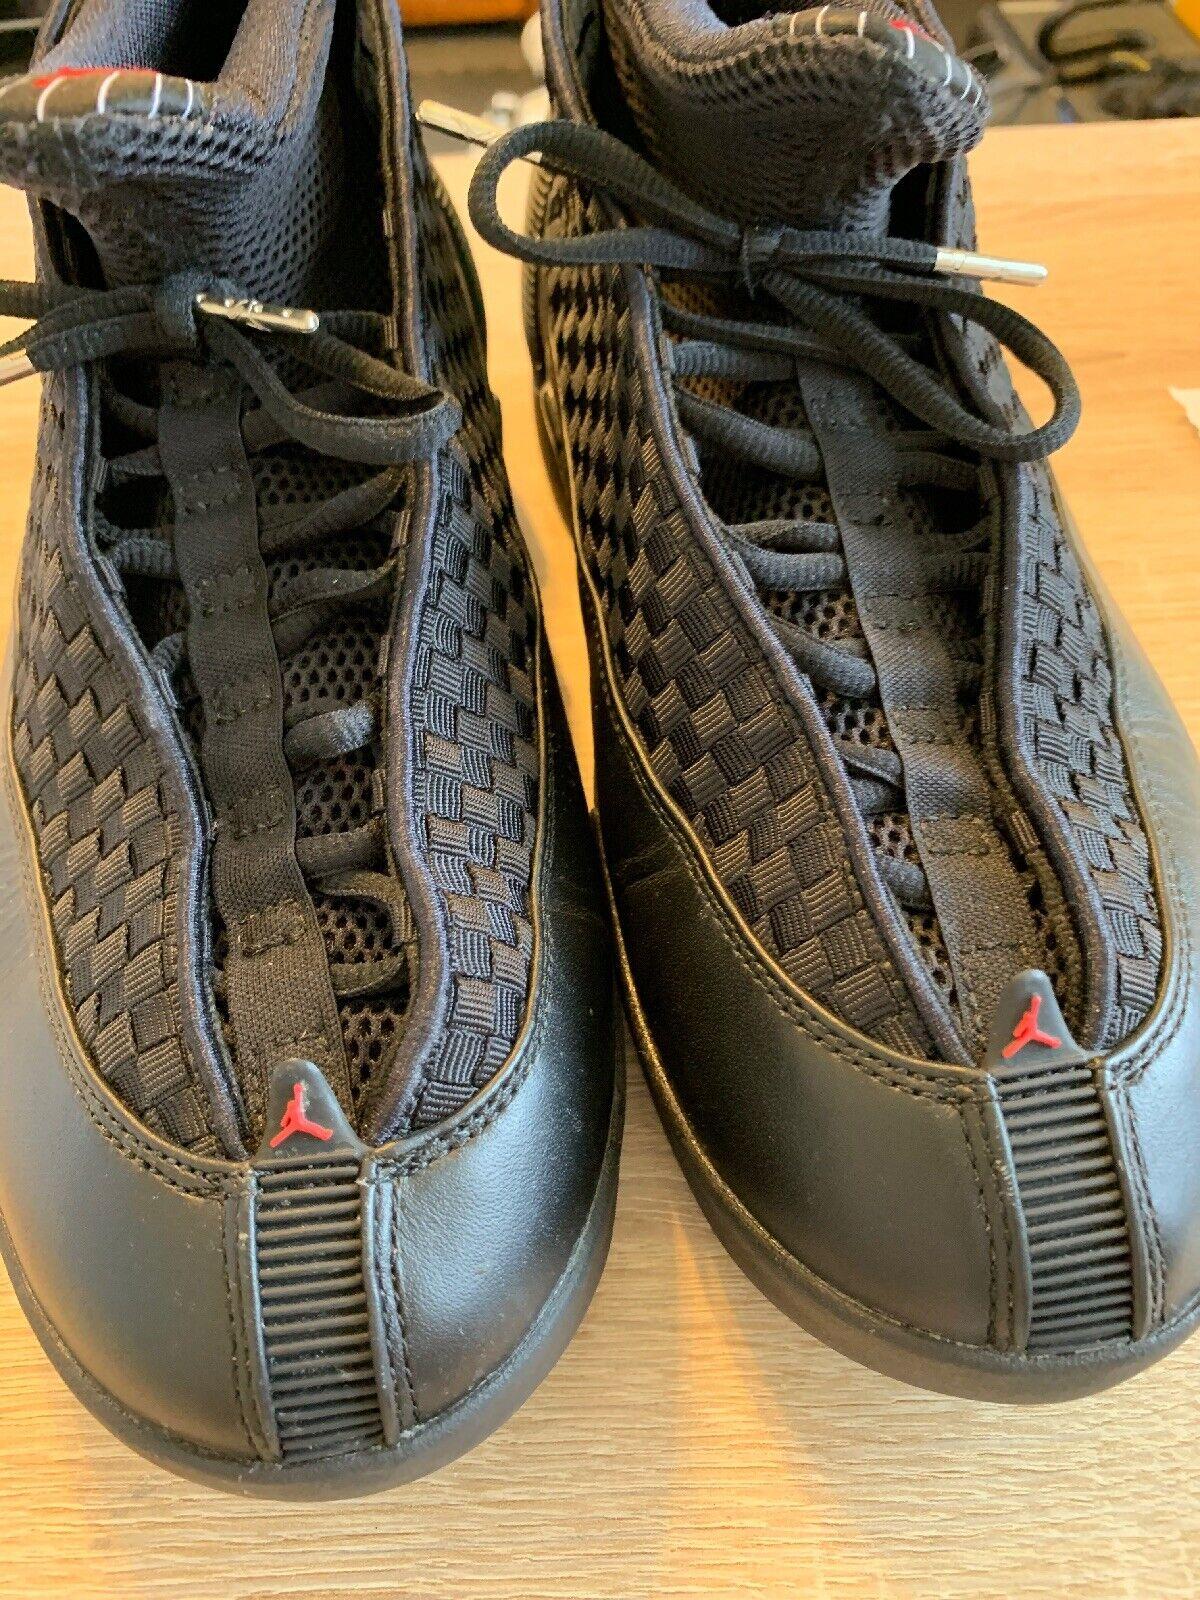 Nike Air Jordan 15 XV Retro BLACK VARSITY RED STEALTH BRED 23 Boost  881429 001